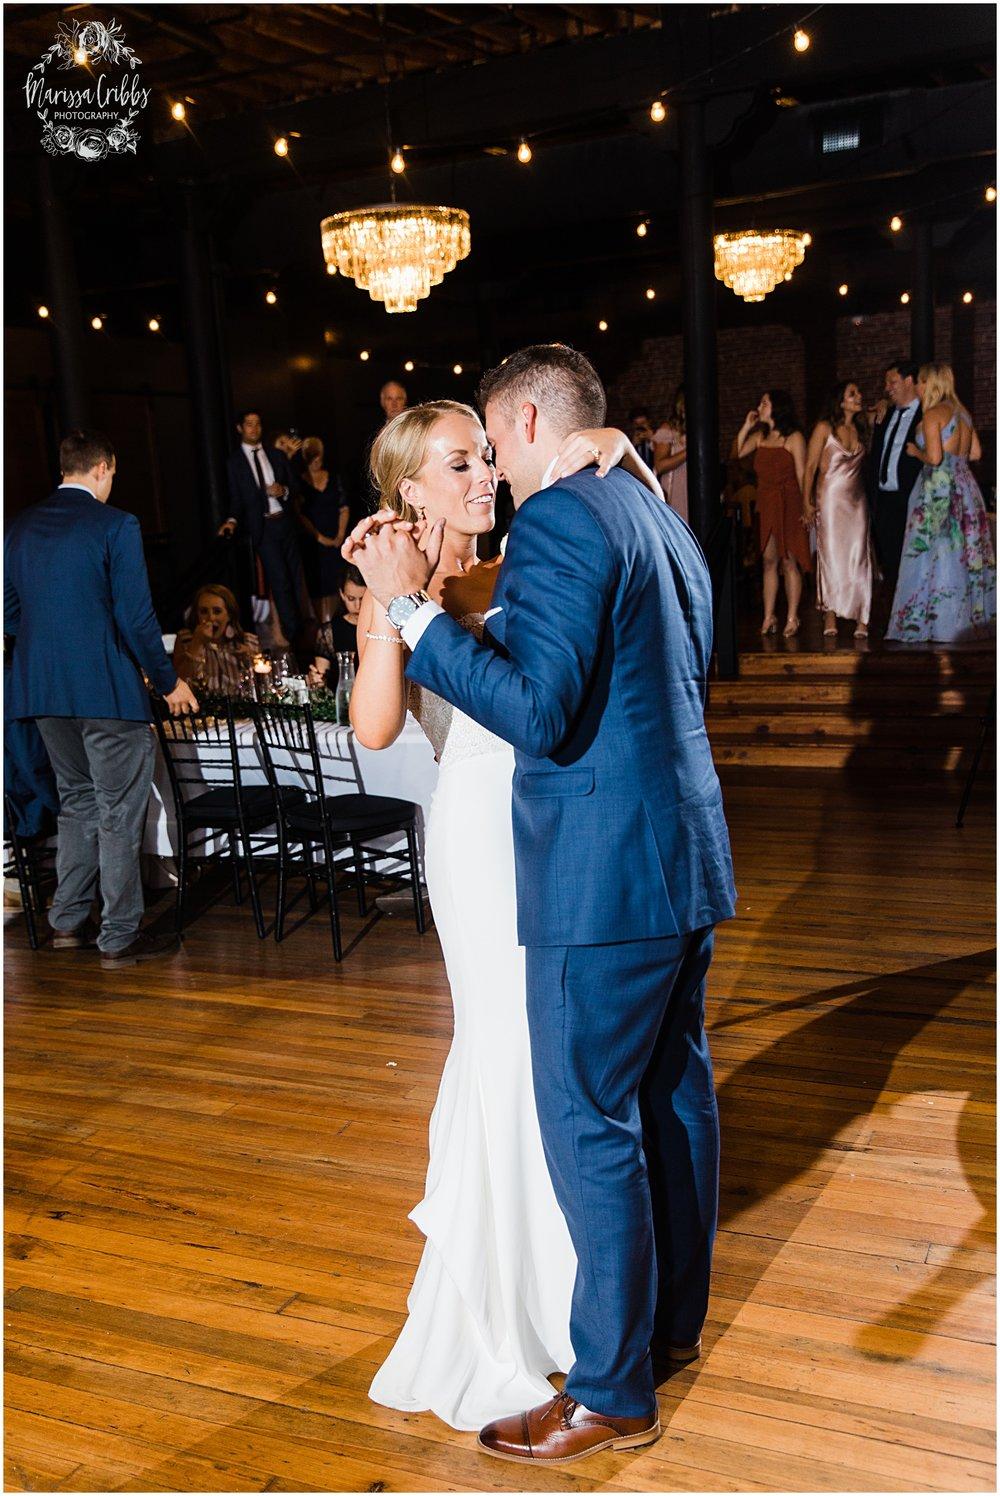 MAGNOLIA VENUE WEDDING | CHARLIE & NATALIE | MARISSA CRIBBS PHOTOGRAPHY_5800.jpg